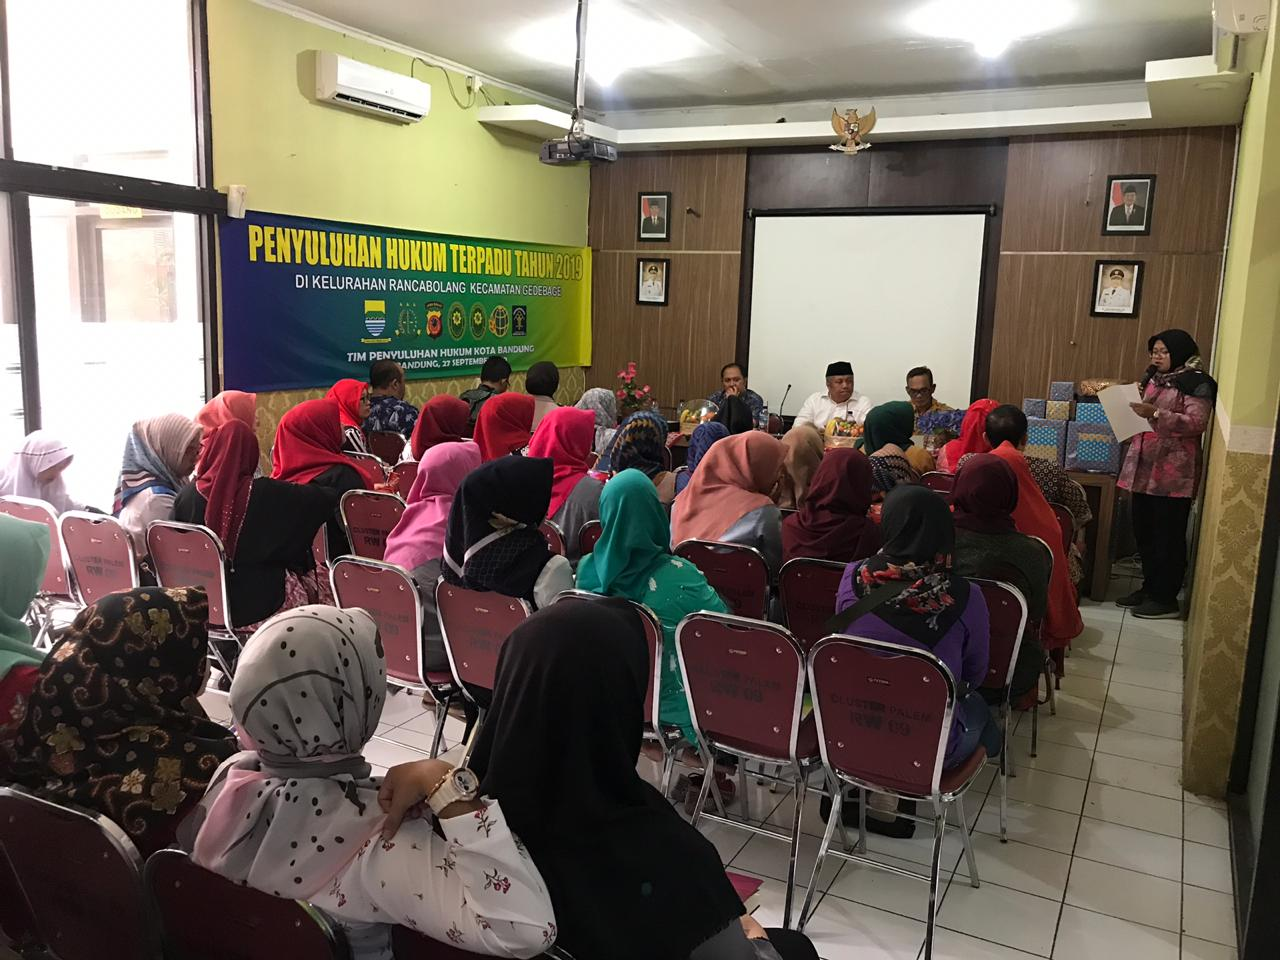 Preview PENYULUHAN HUKUM TERPADU TAHUN 2019 DI KELURAHAN RANCABOLANG KECAMATAN GEDEBAGE. JUMAT, 27 SEPTEMBER 2019.